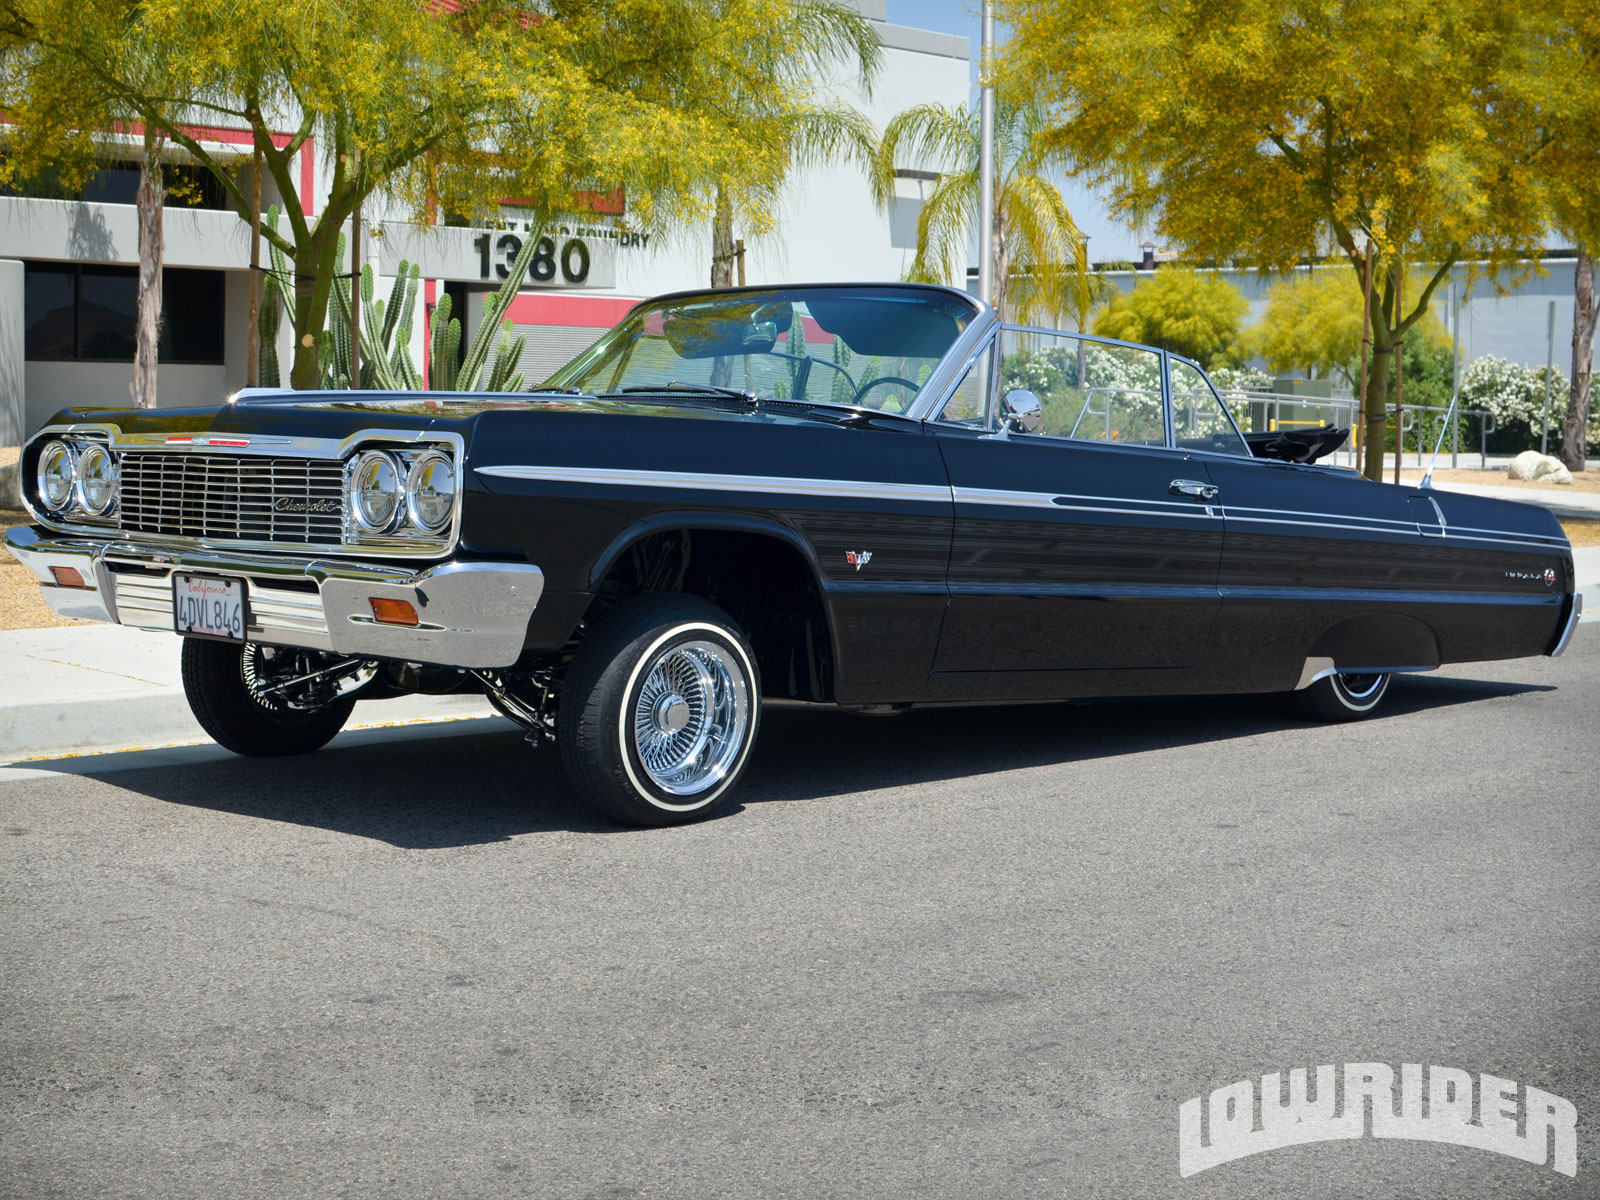 1964 Chevrolet Impala SS Rag Top - Lowrider Magazine